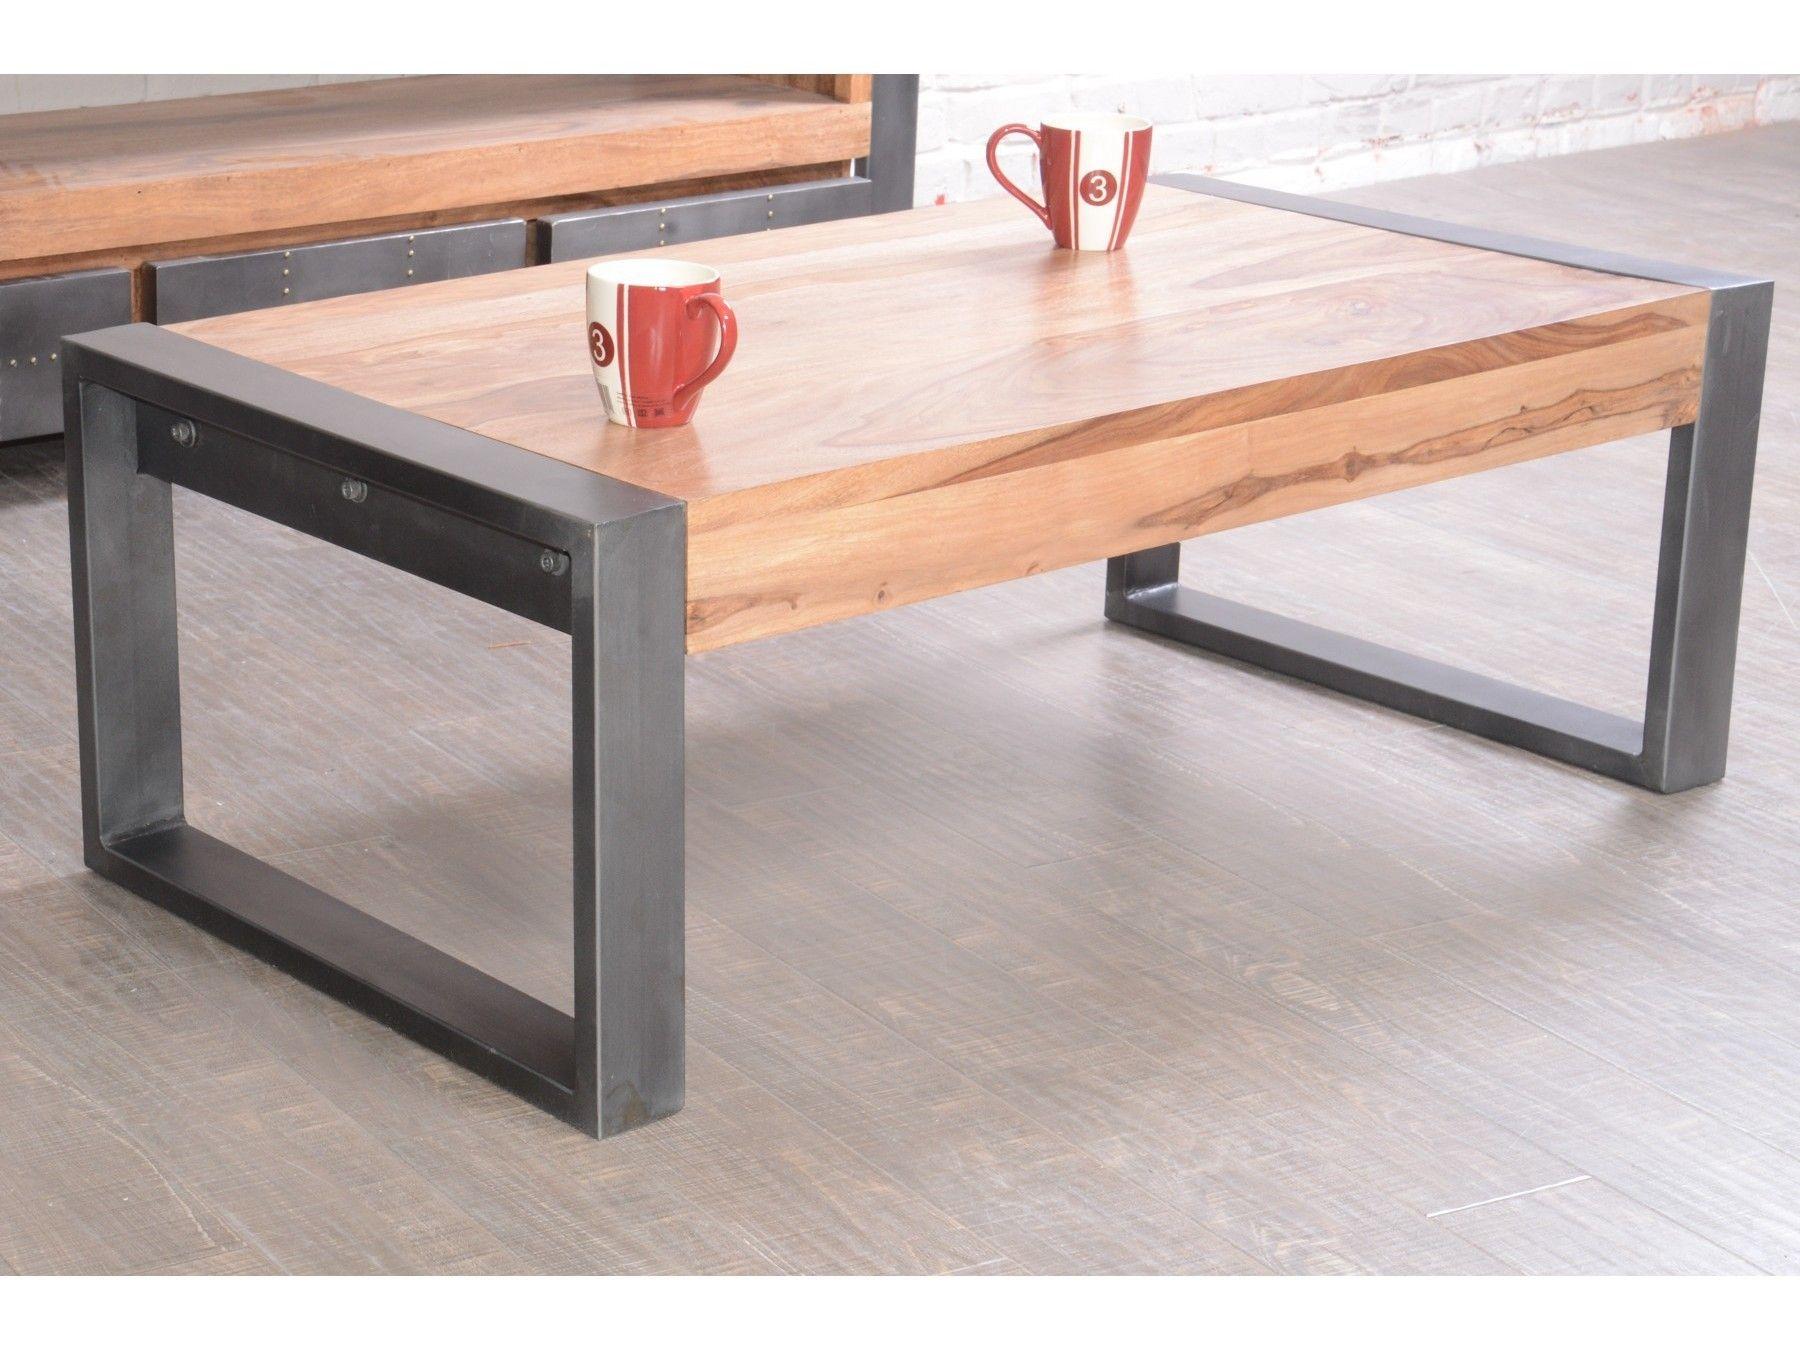 Meuble basse en palissandre acier House et Table Industry lcJTKF1